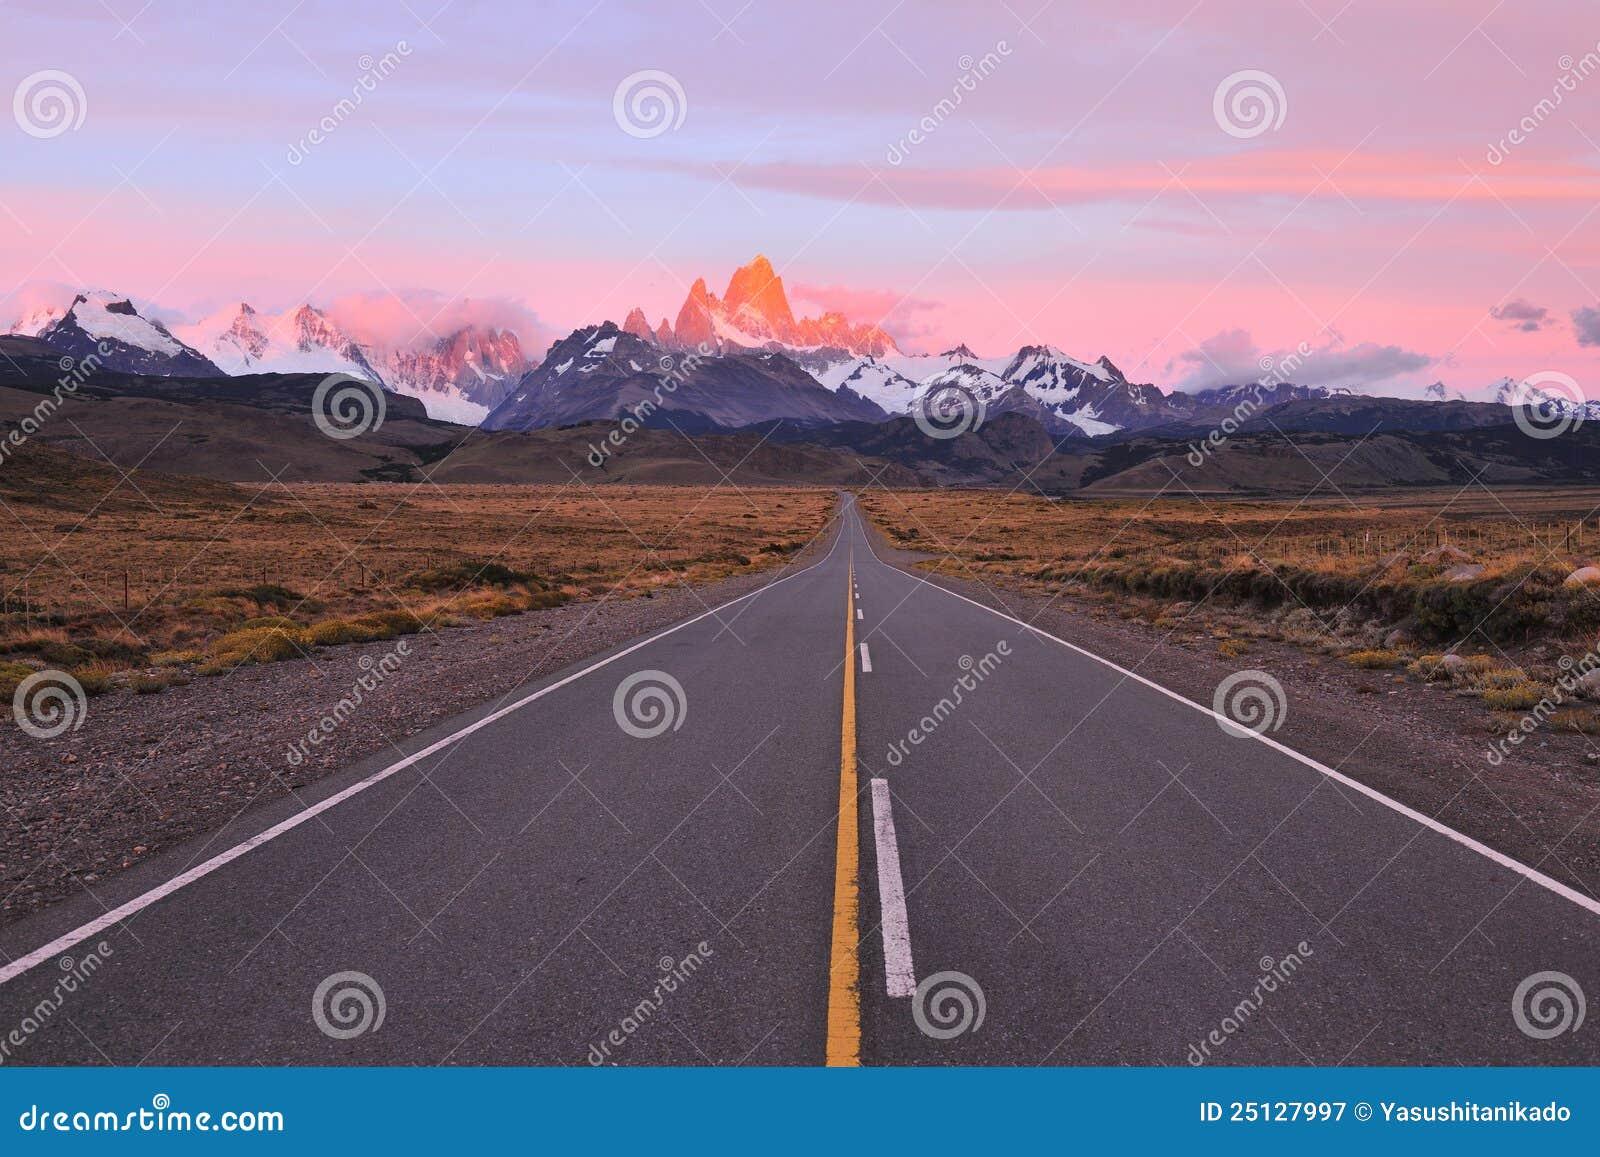 Road to patagonian mountains